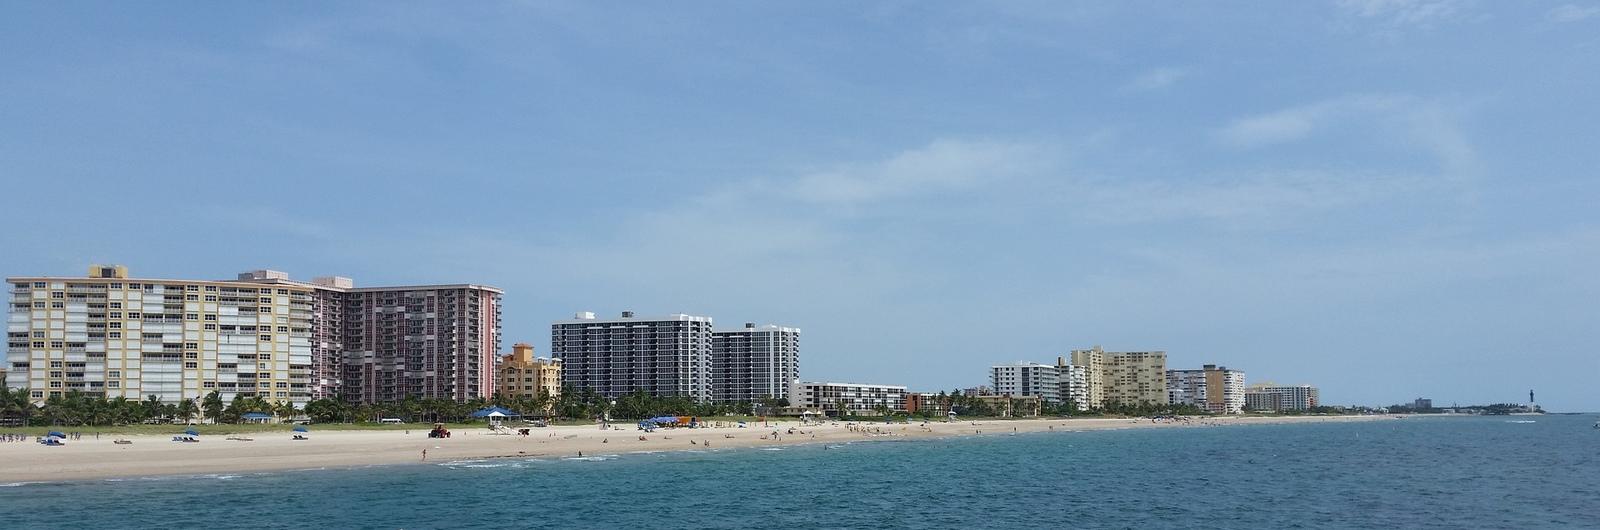 pompano beach city header